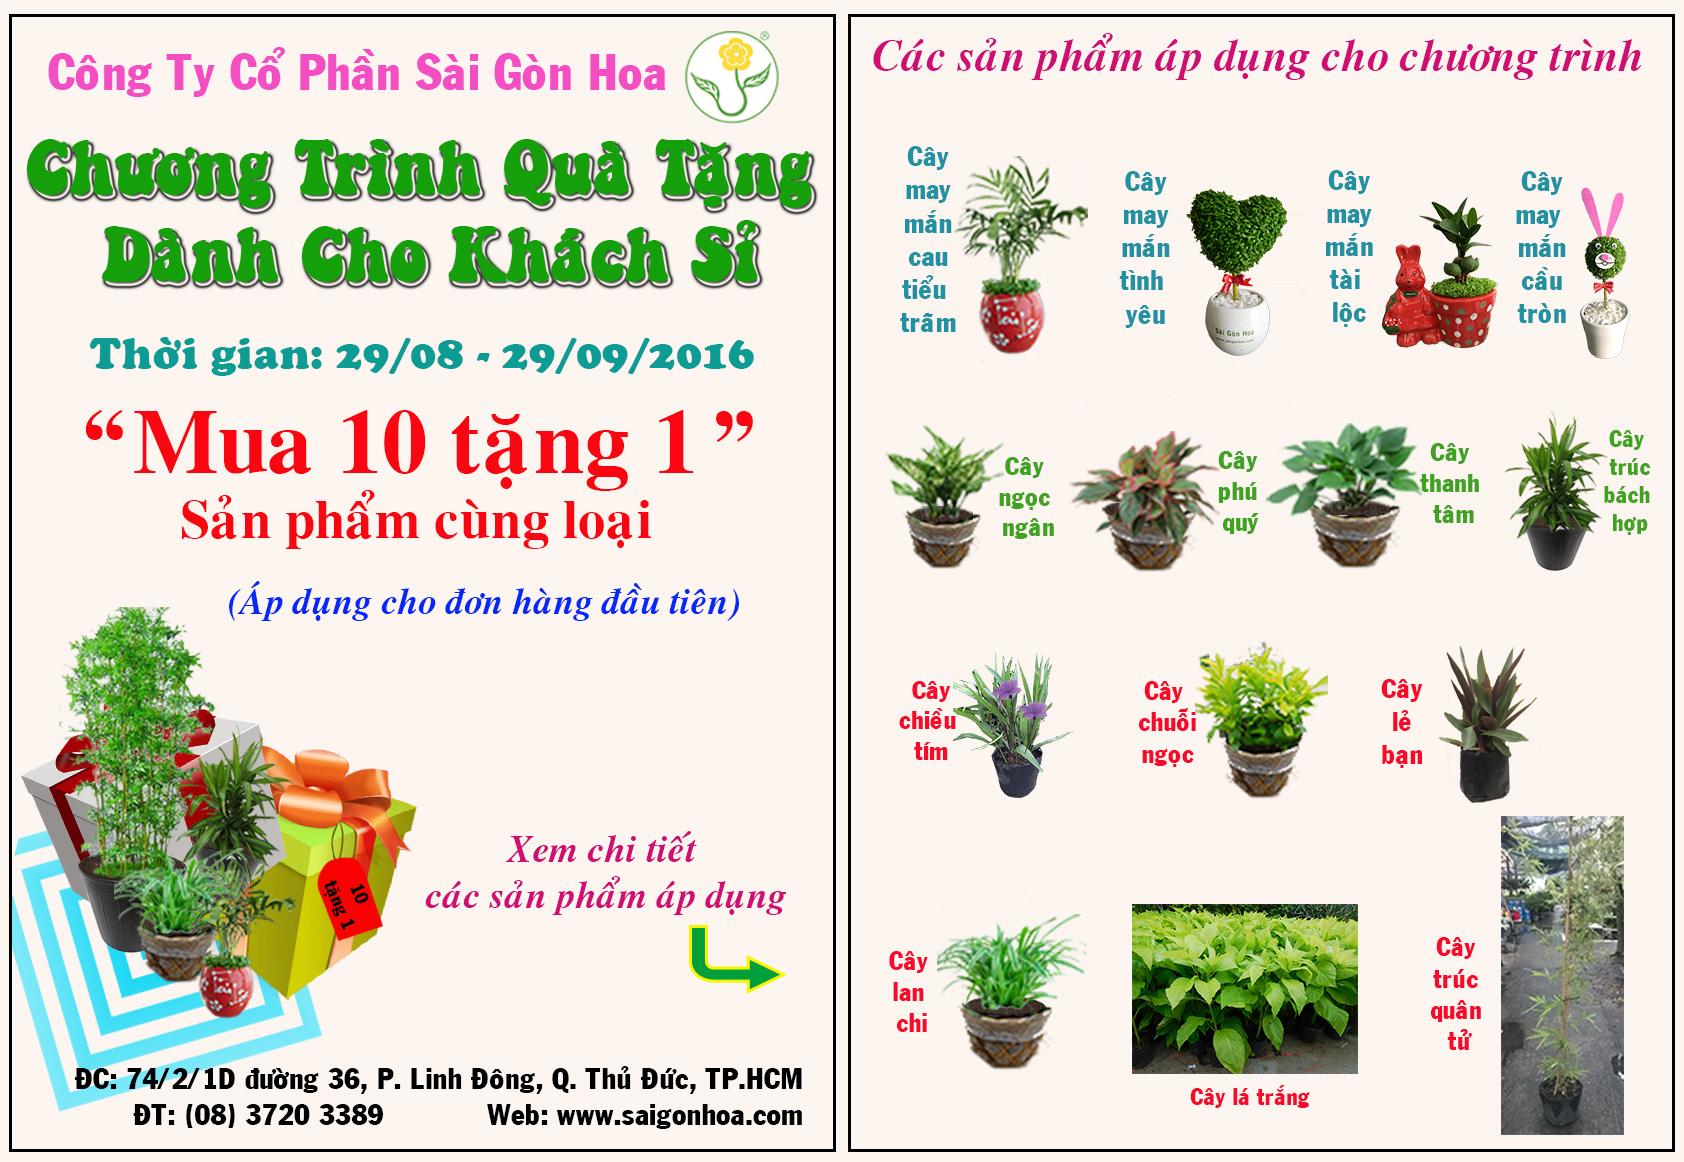 chuong trinh qua tang khach si thang 9